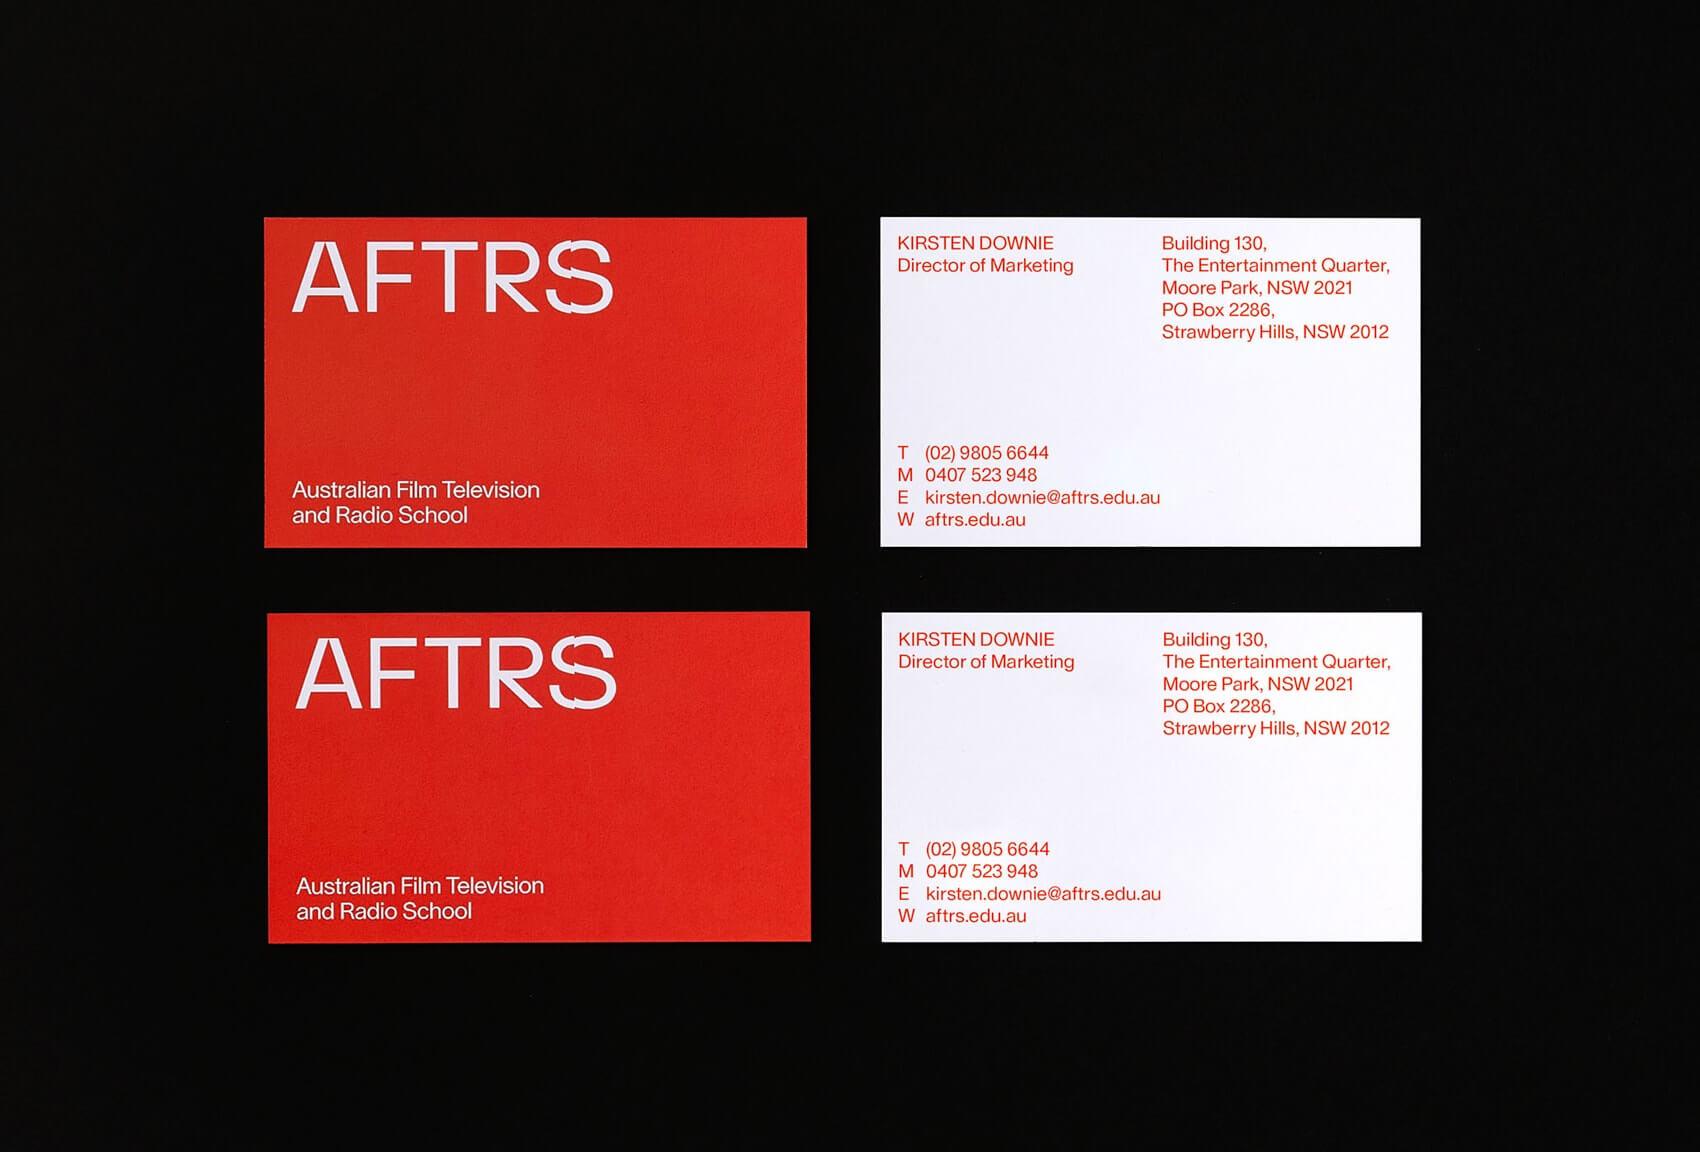 Best Film Schools Australian Film Television and Radio School